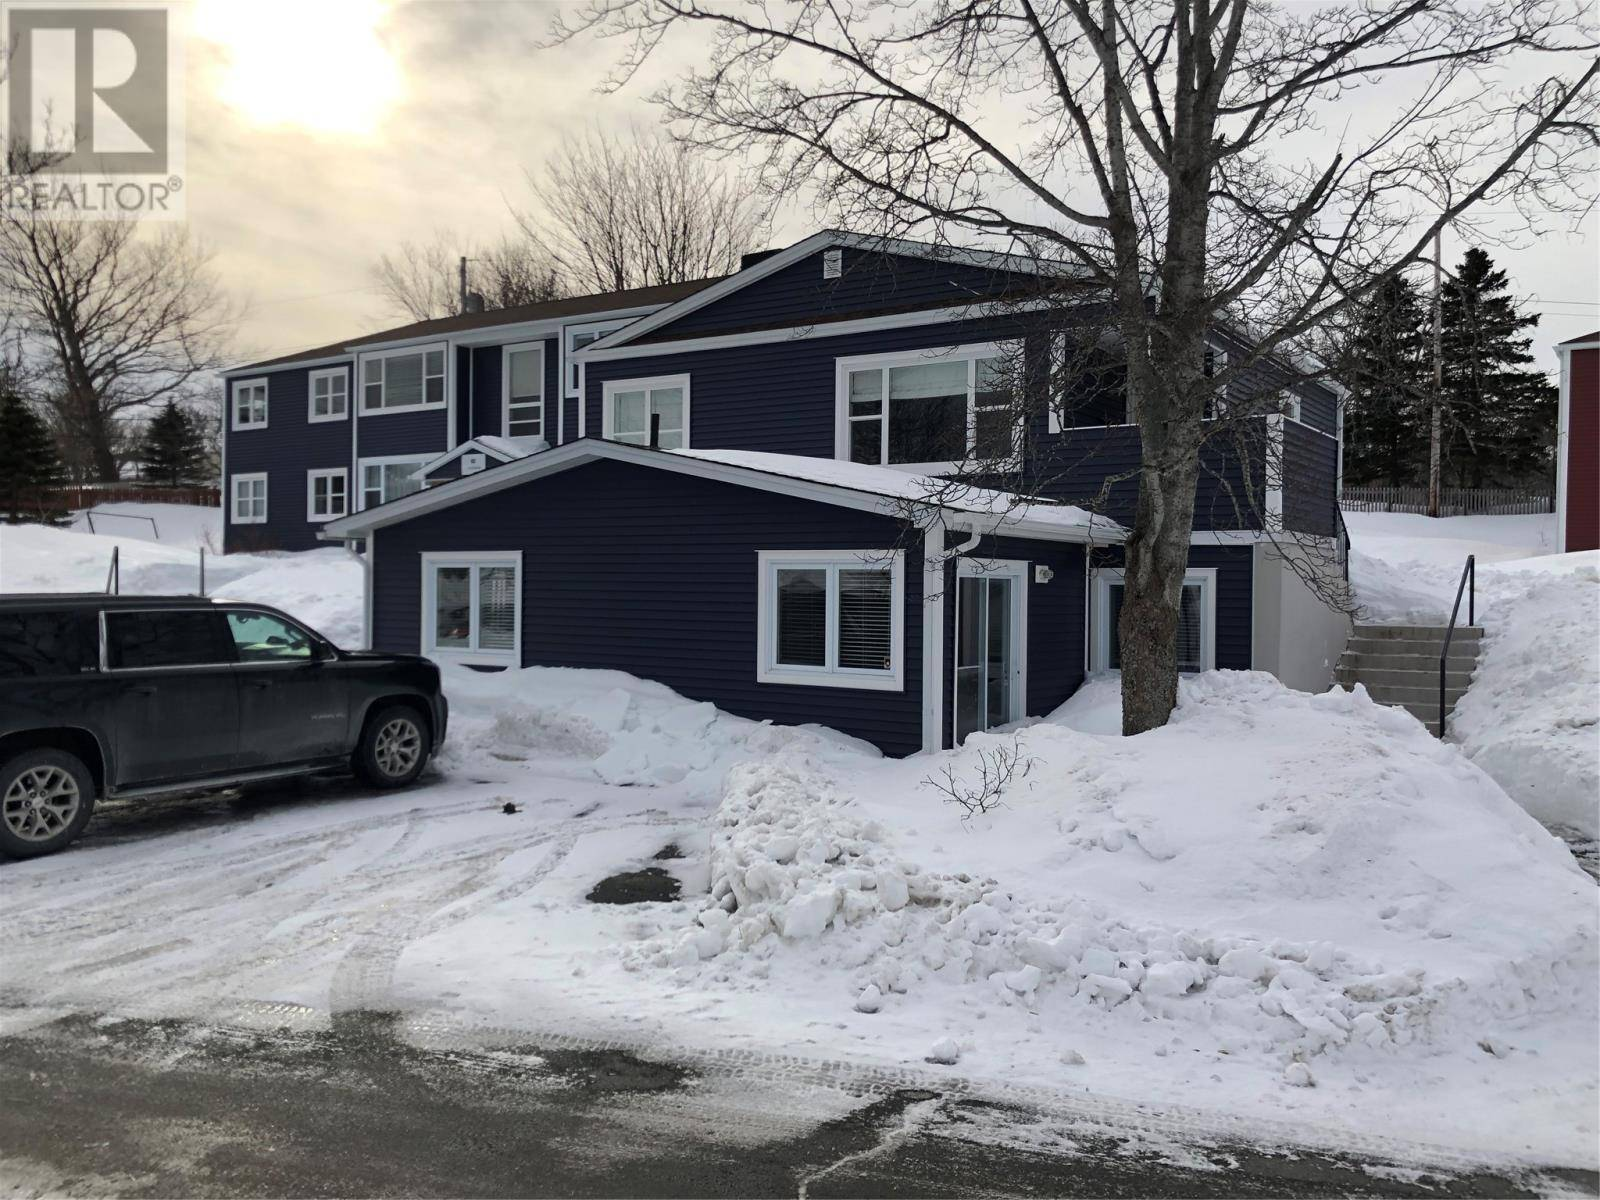 House for sale at 92 Allandale Pl Unit 15a St. John's Newfoundland - MLS: 1211265